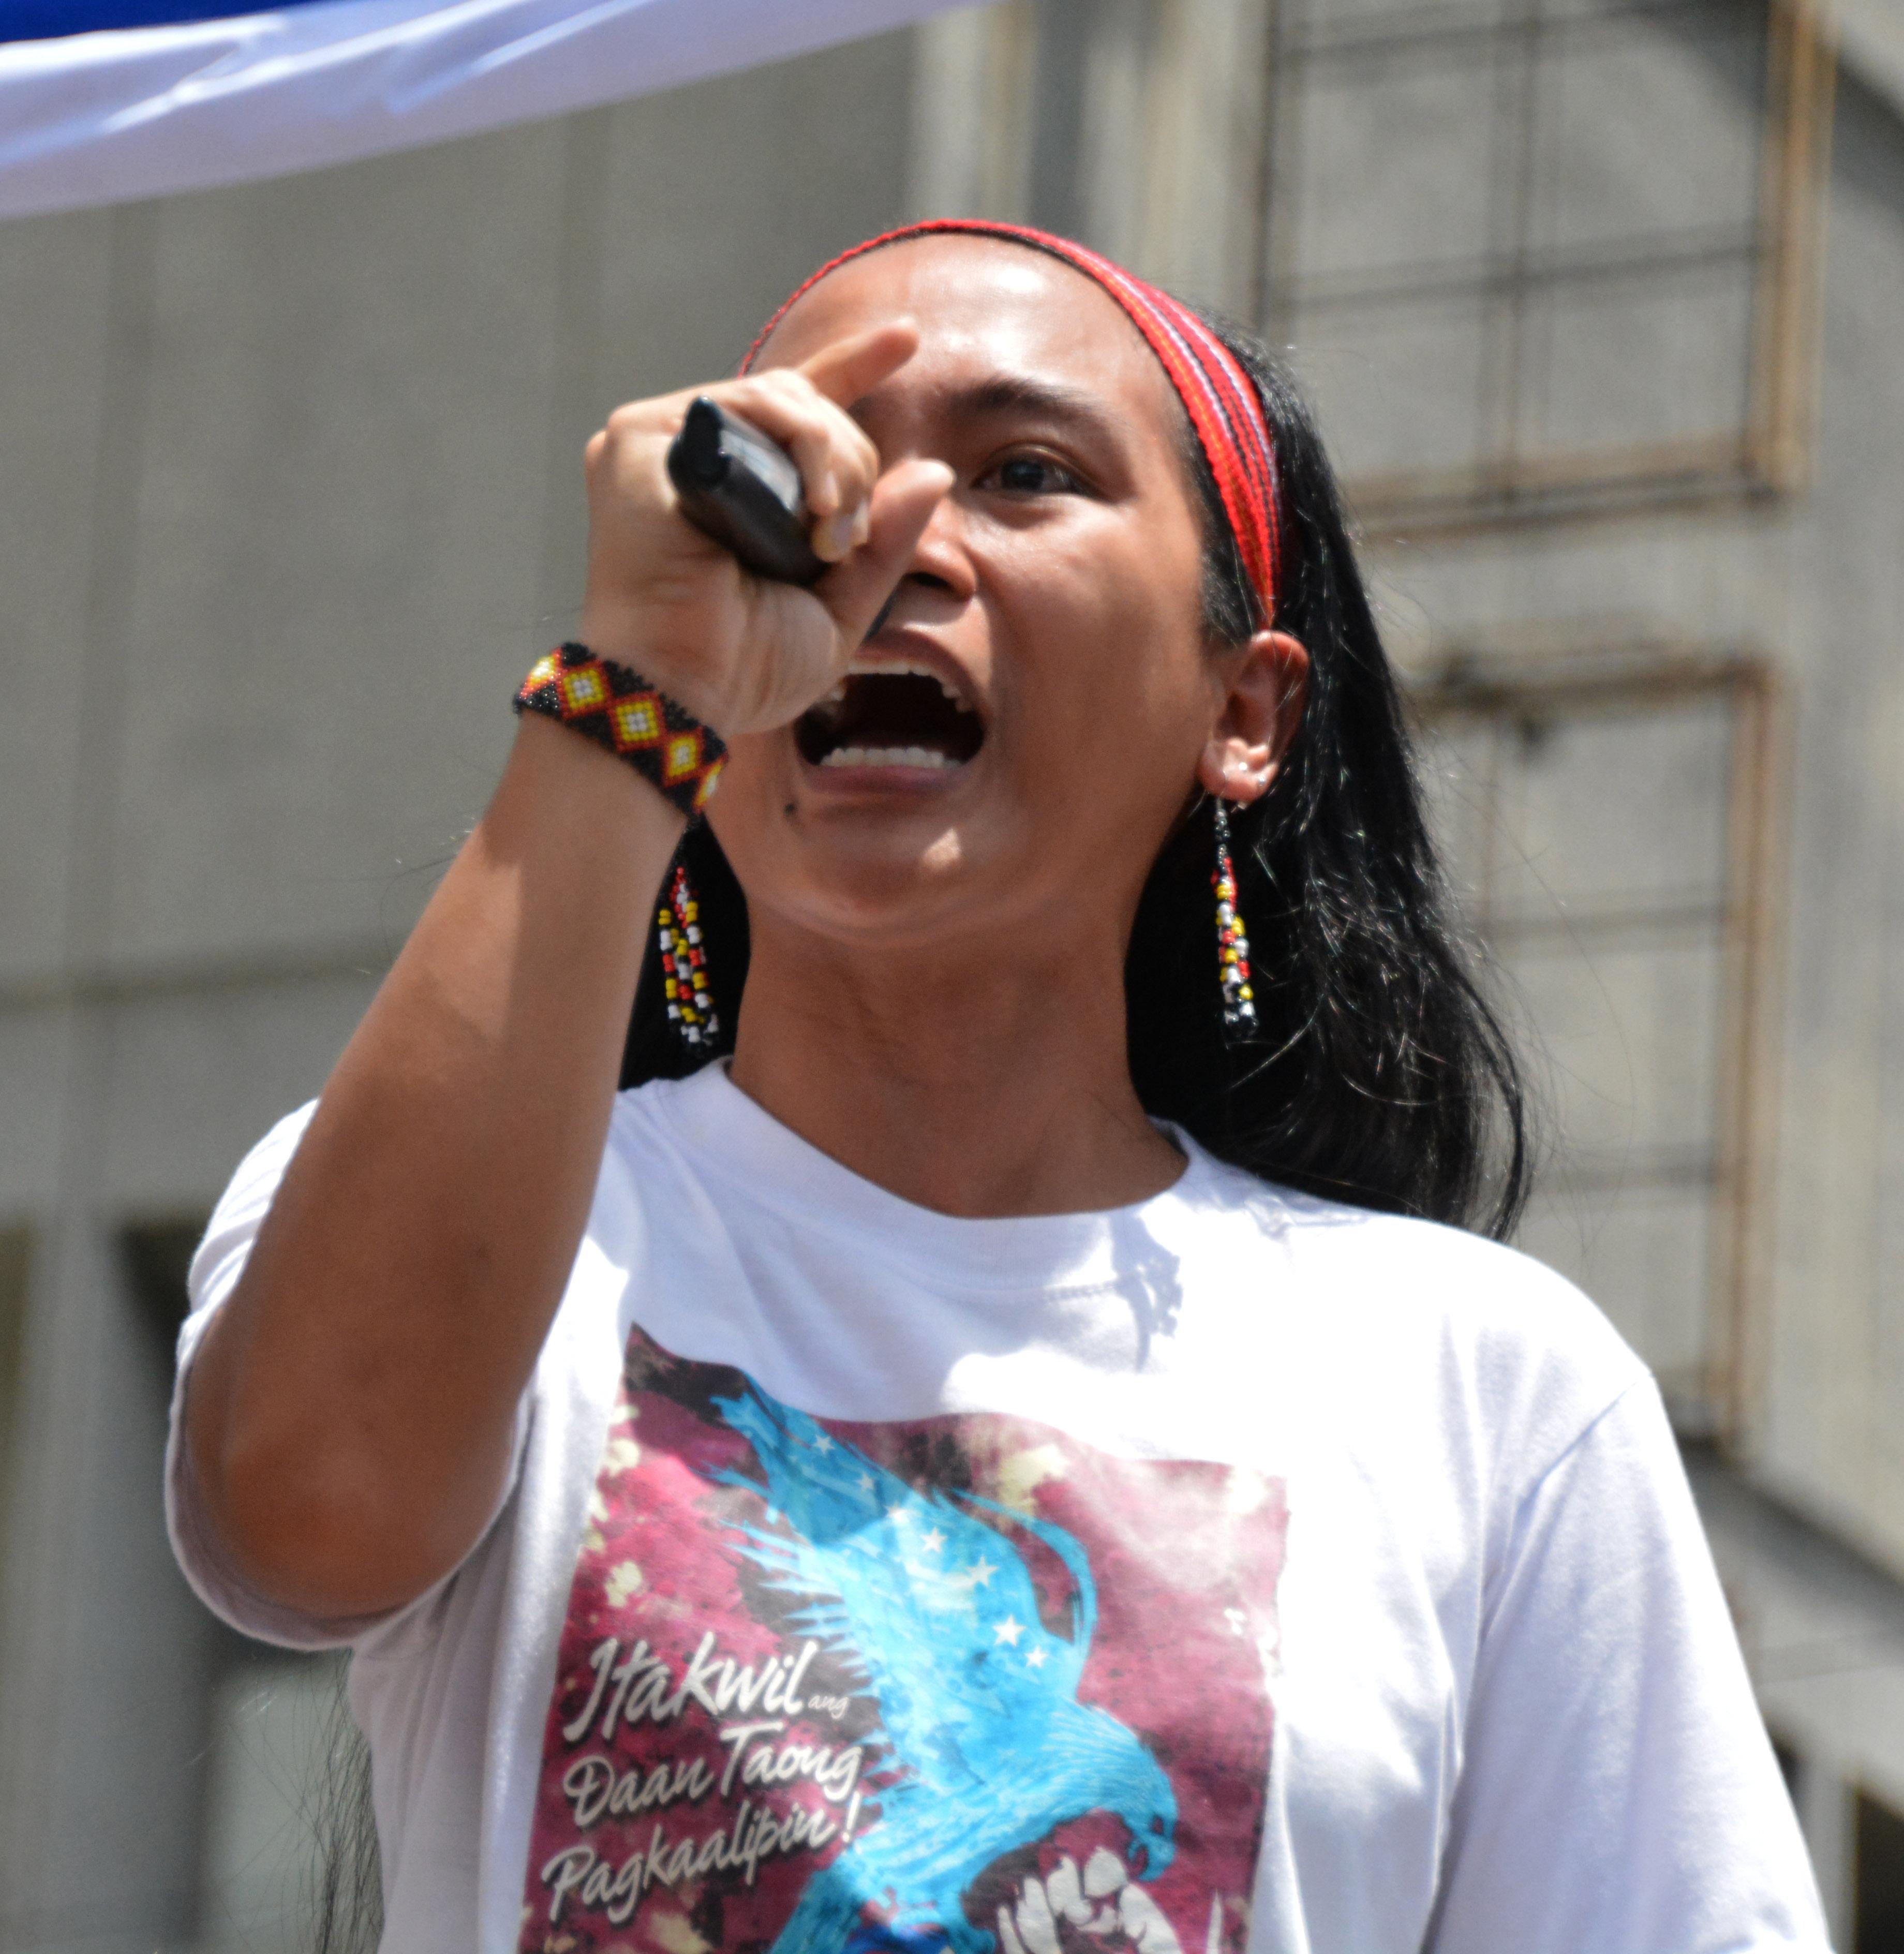 Sandugo convenor Piya Macliing Malayao (Photo by Mary Angelique Tacata/Bulatlat)